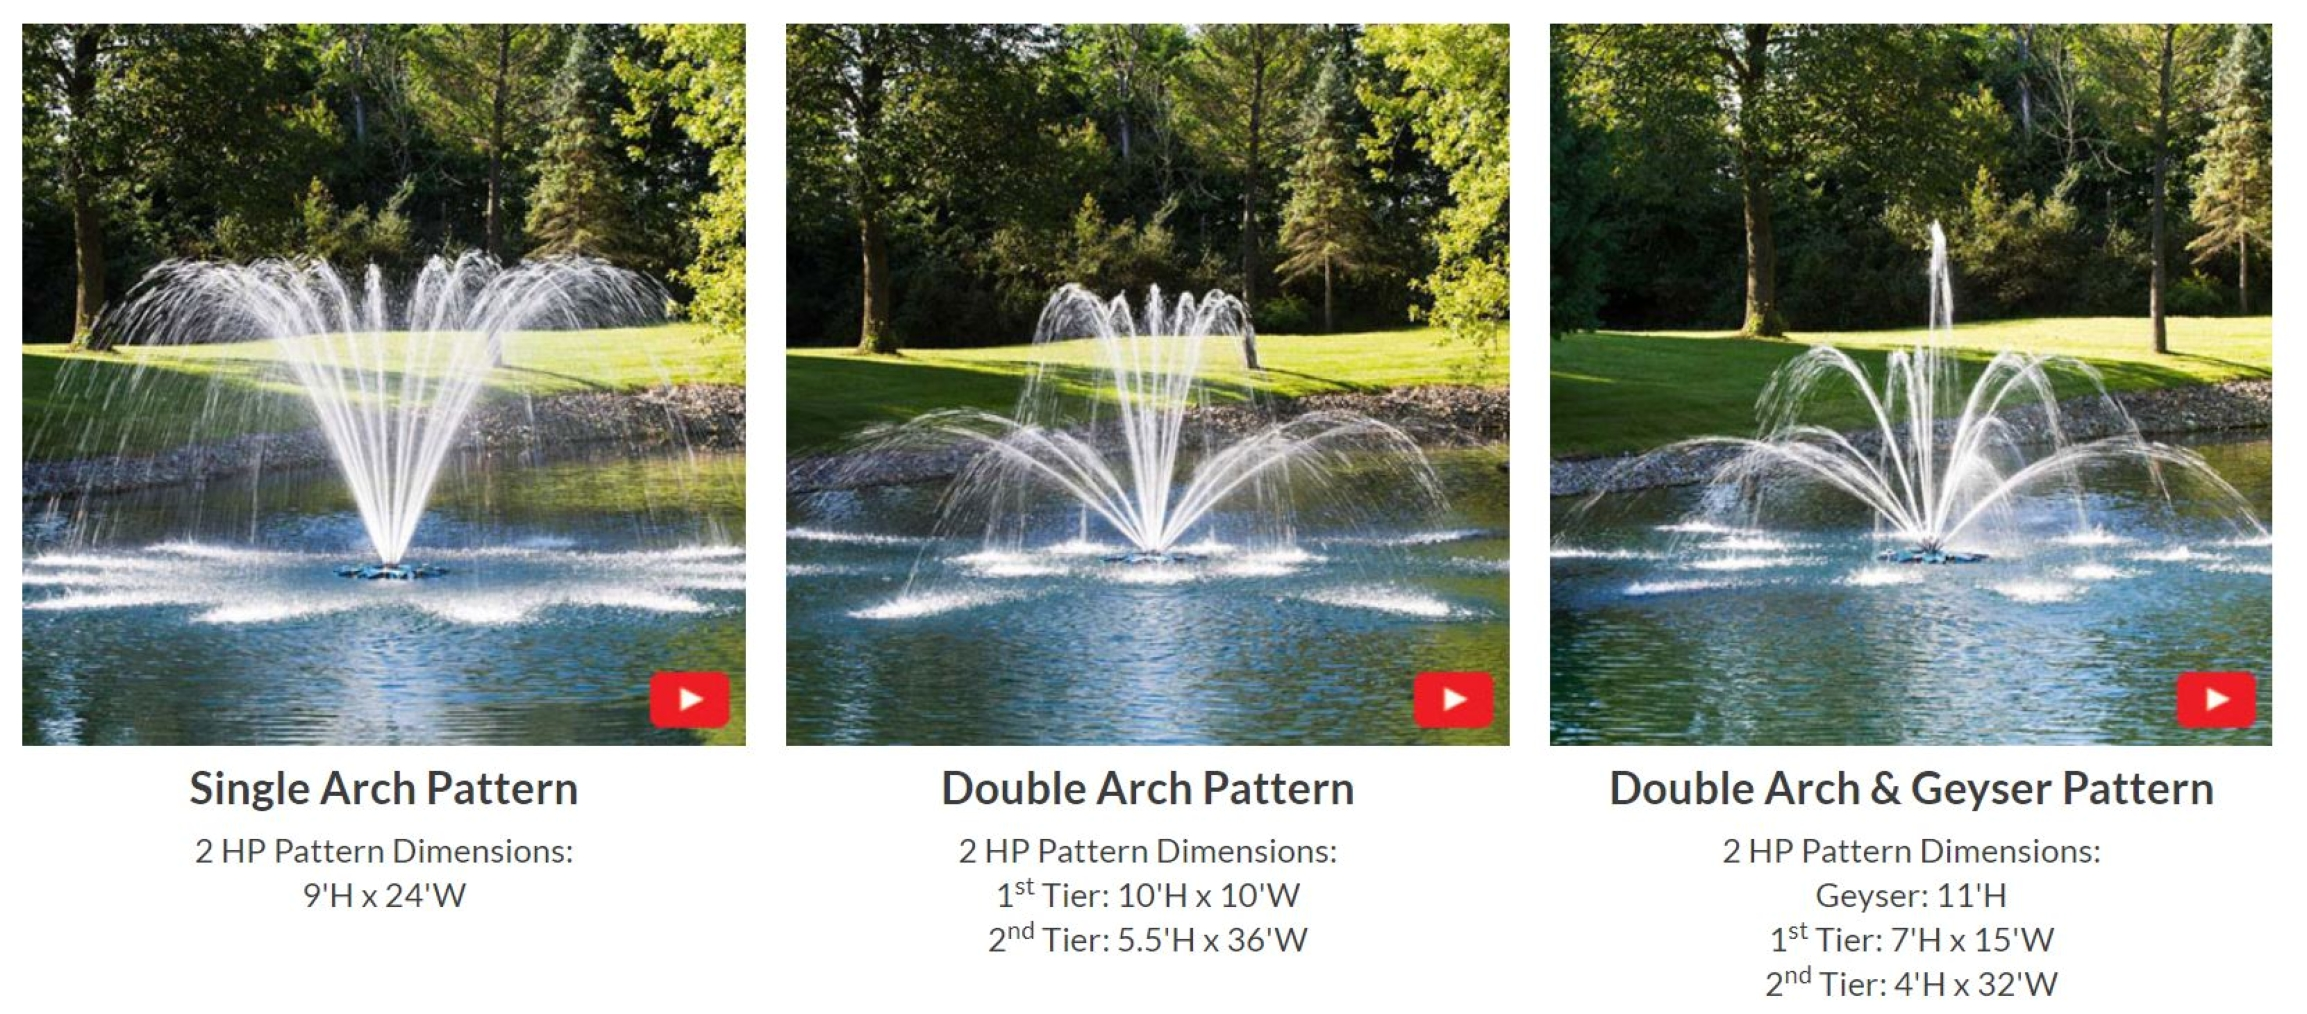 airmax-2-hp-pondseries-pond-fountains-optional-spray-patterns-3.aqua-link.jpg